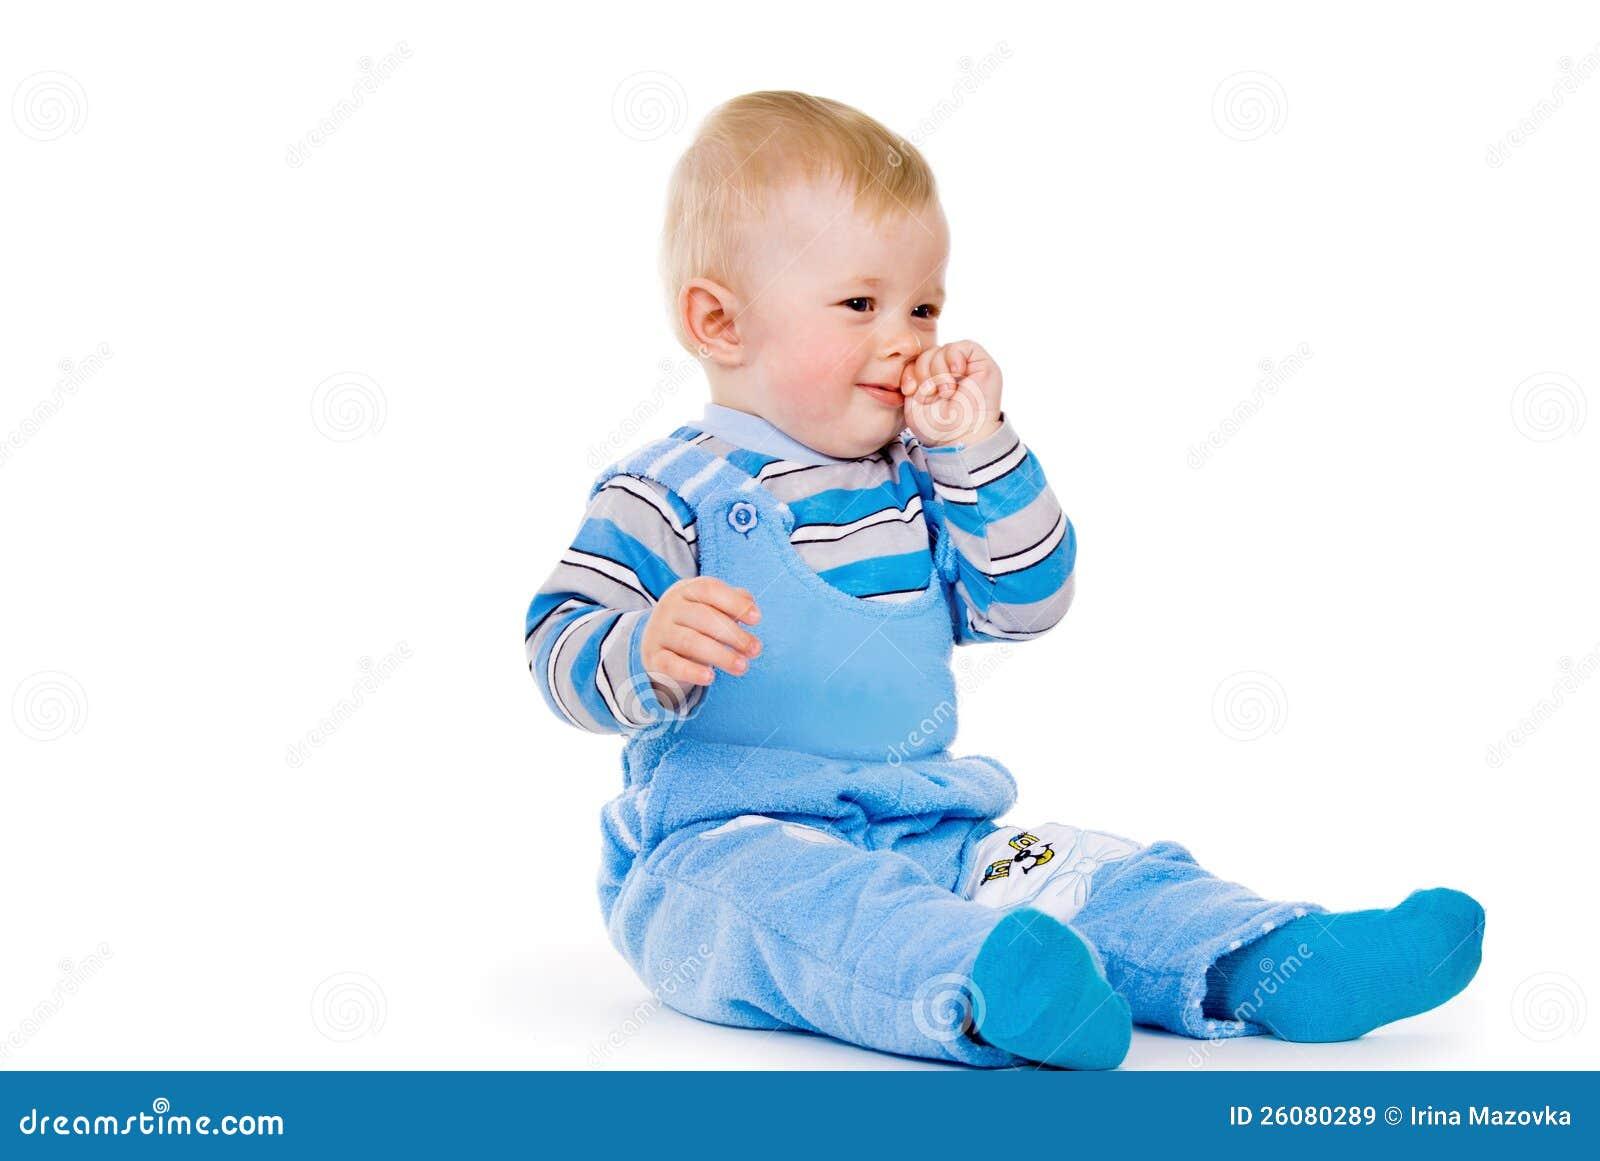 Почему ребенок чешет глаза и нос